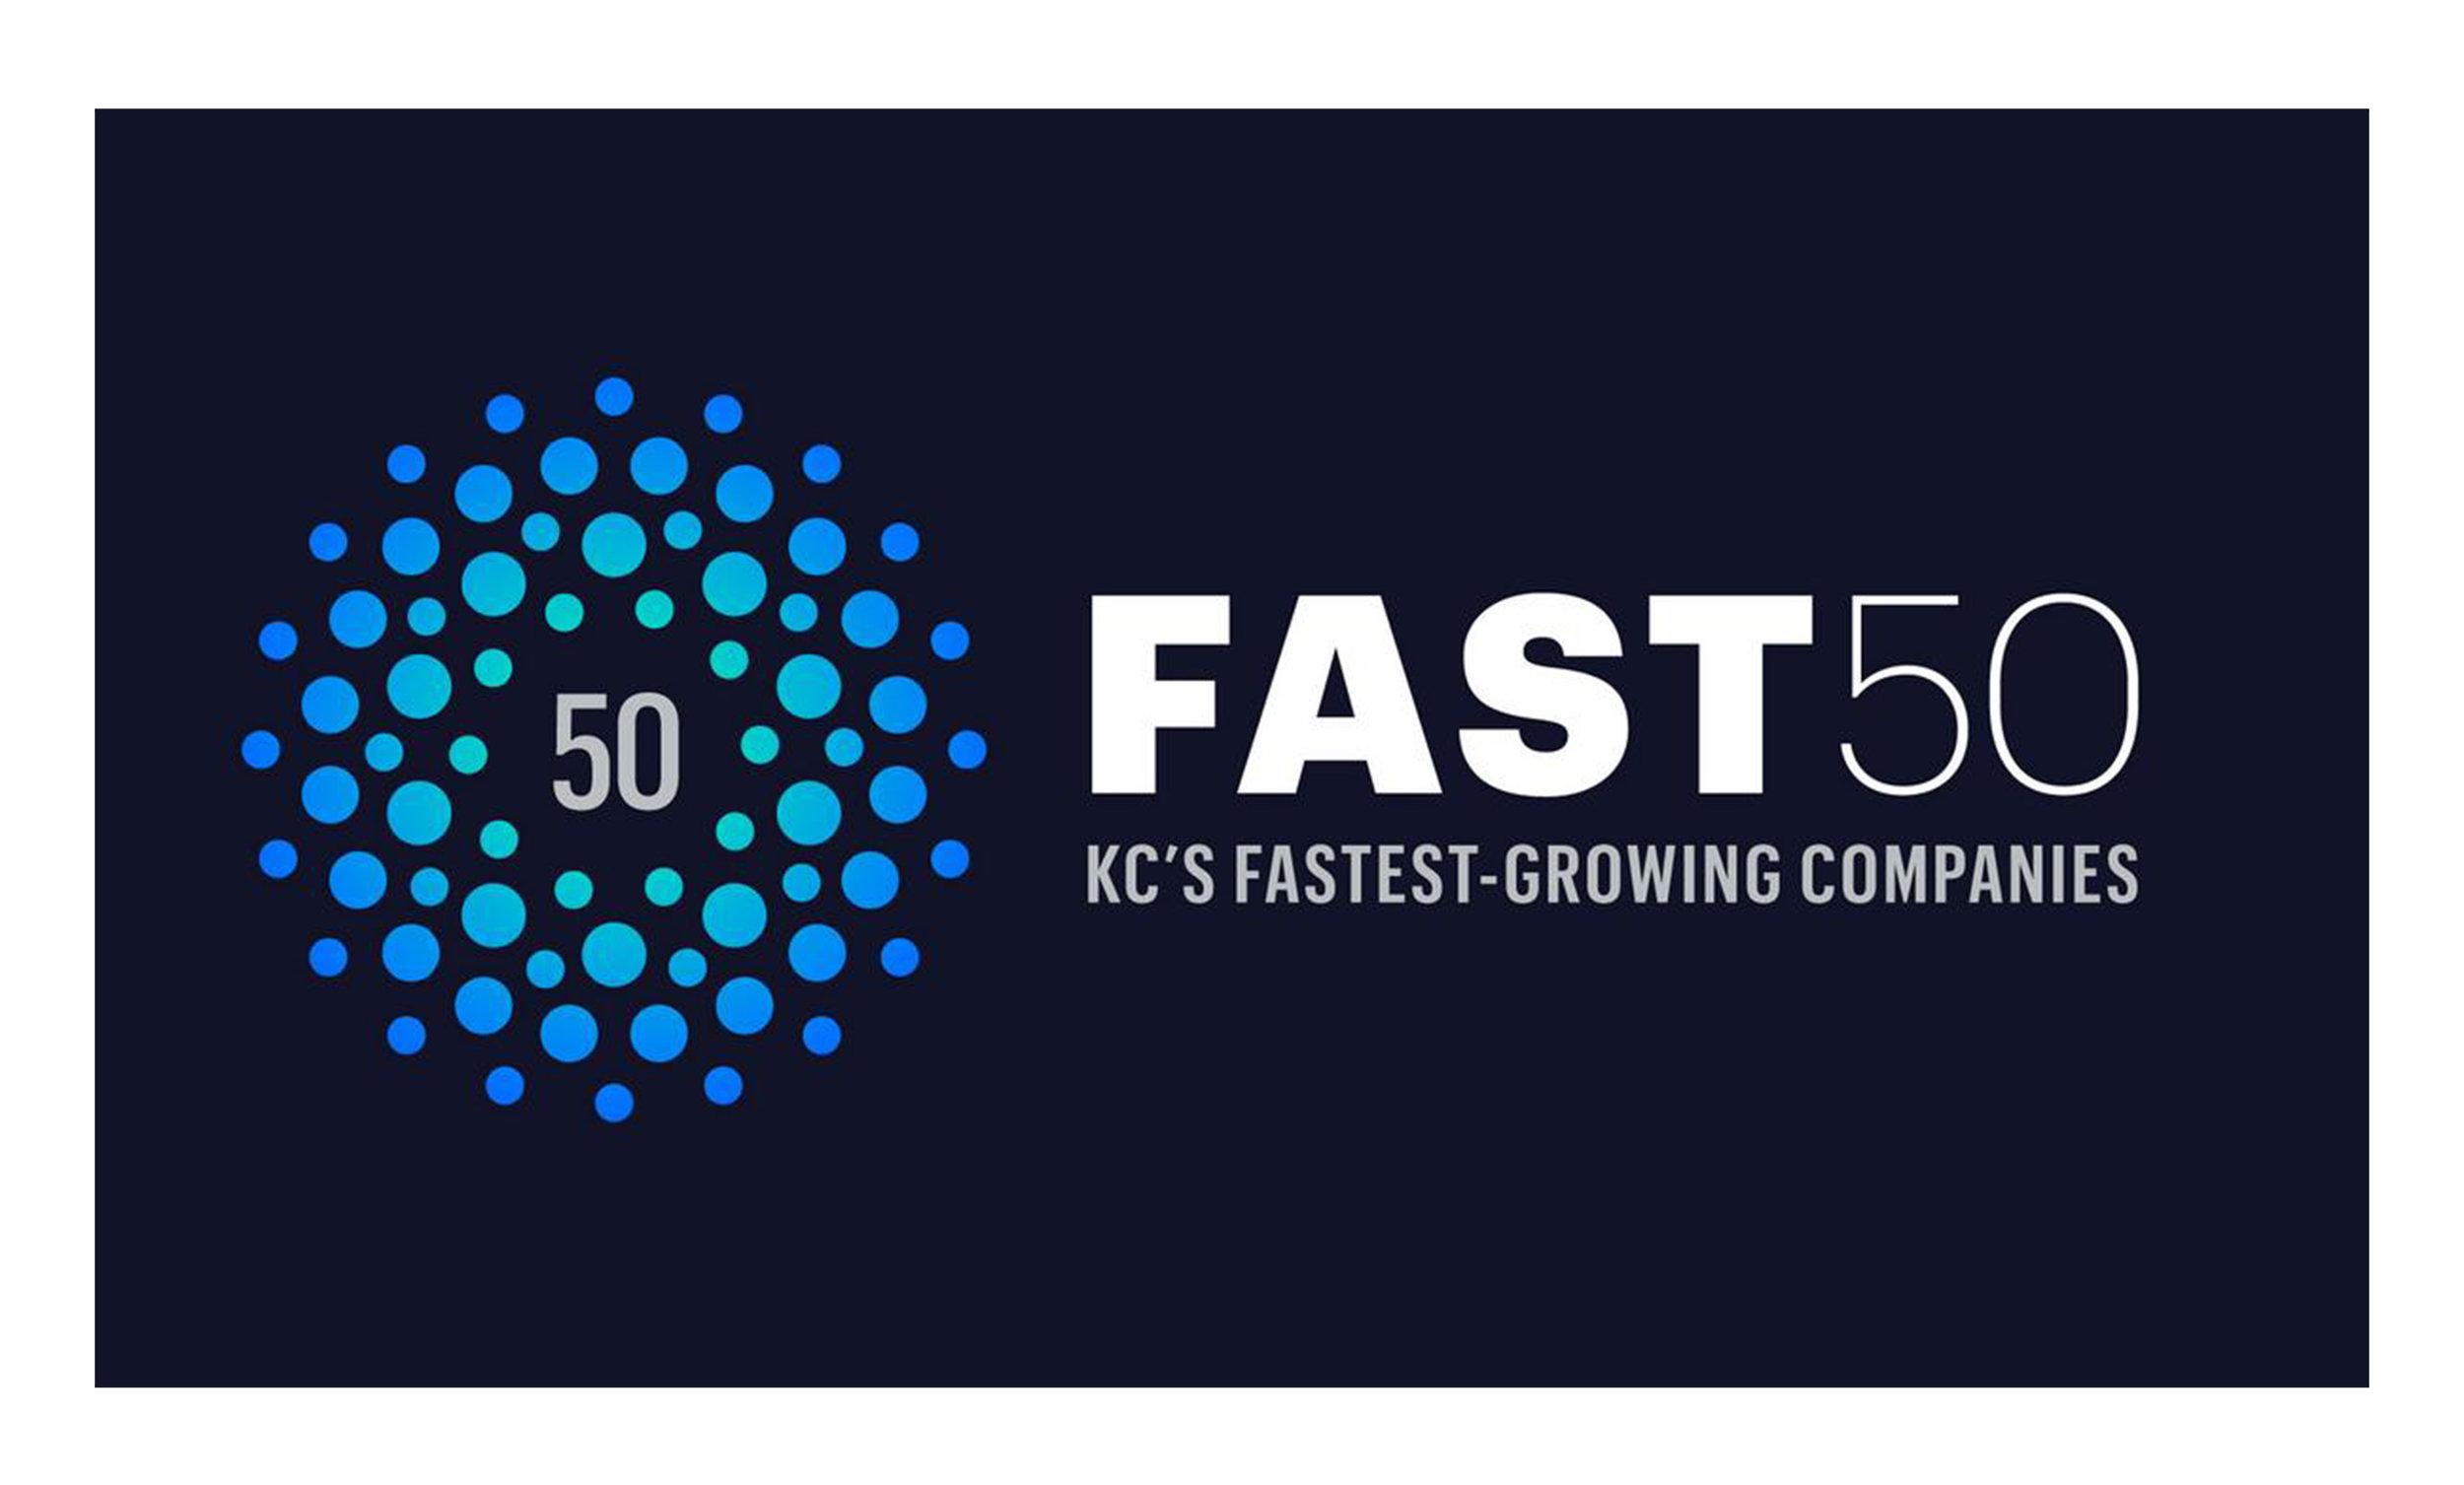 Fast50.jpg